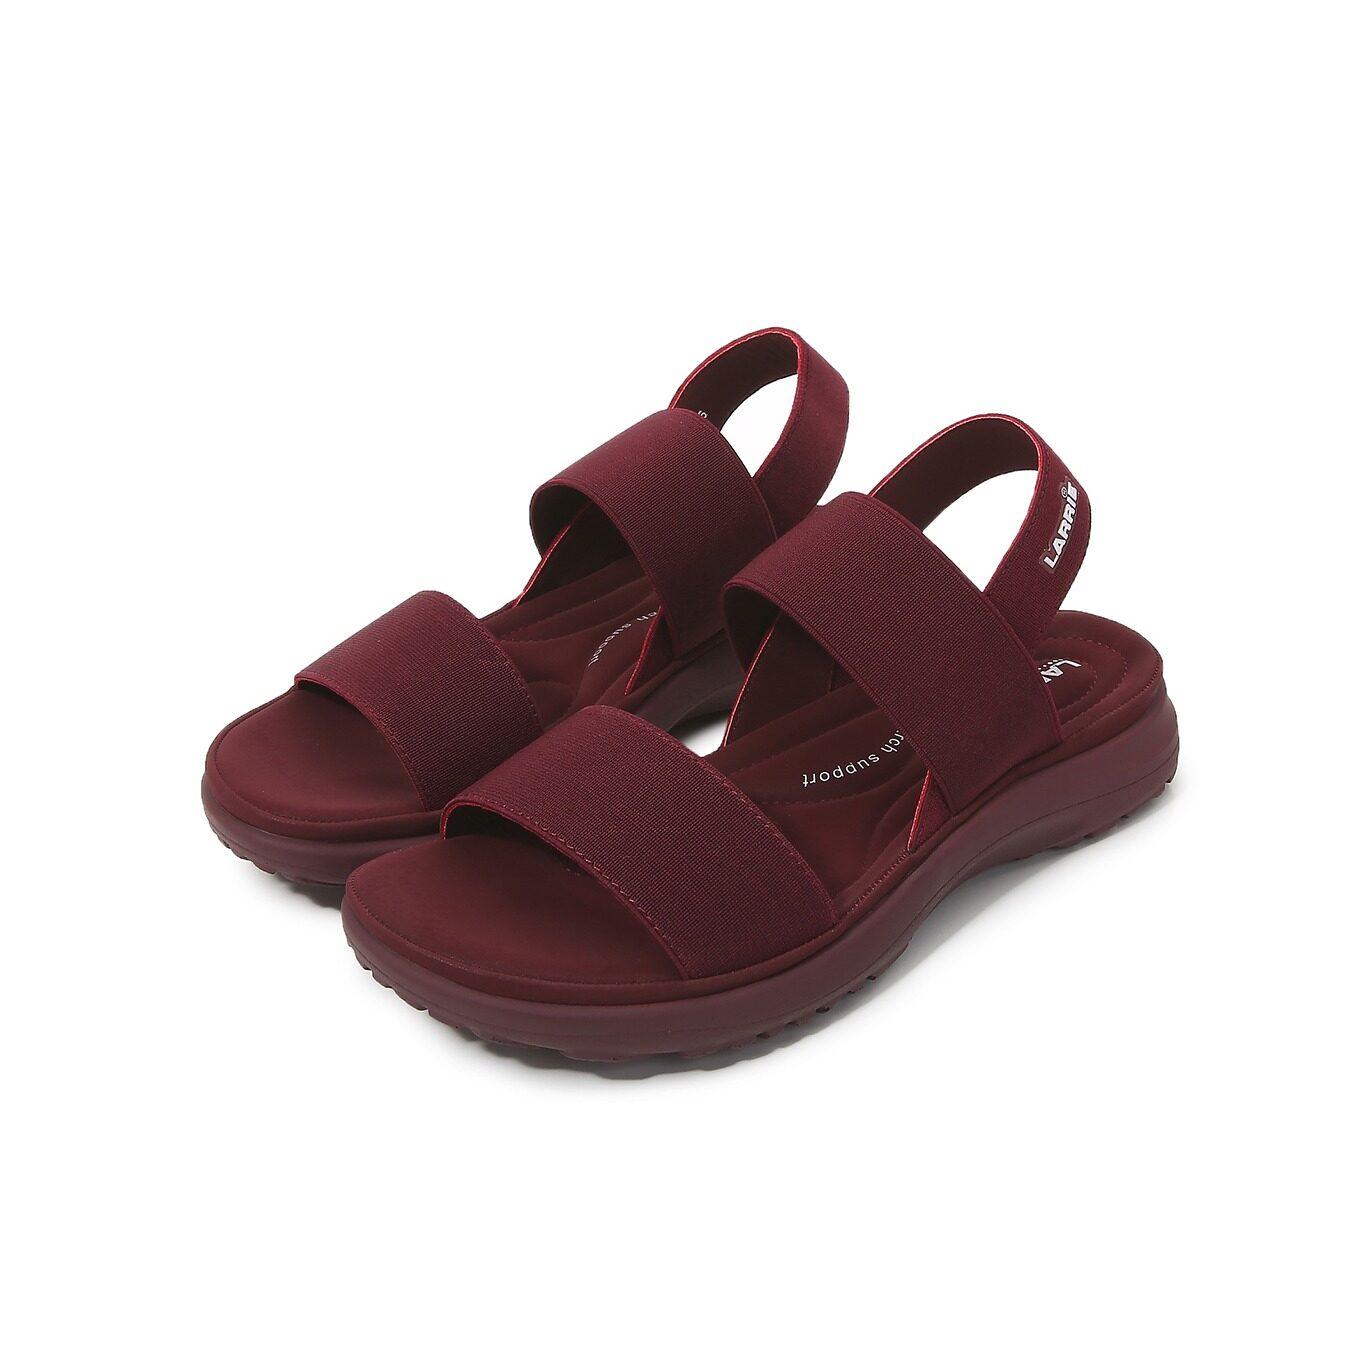 LARRIE Kasut Perempuan Strap Lifestyle Casual Women's Sandal - L92002-CV01SV